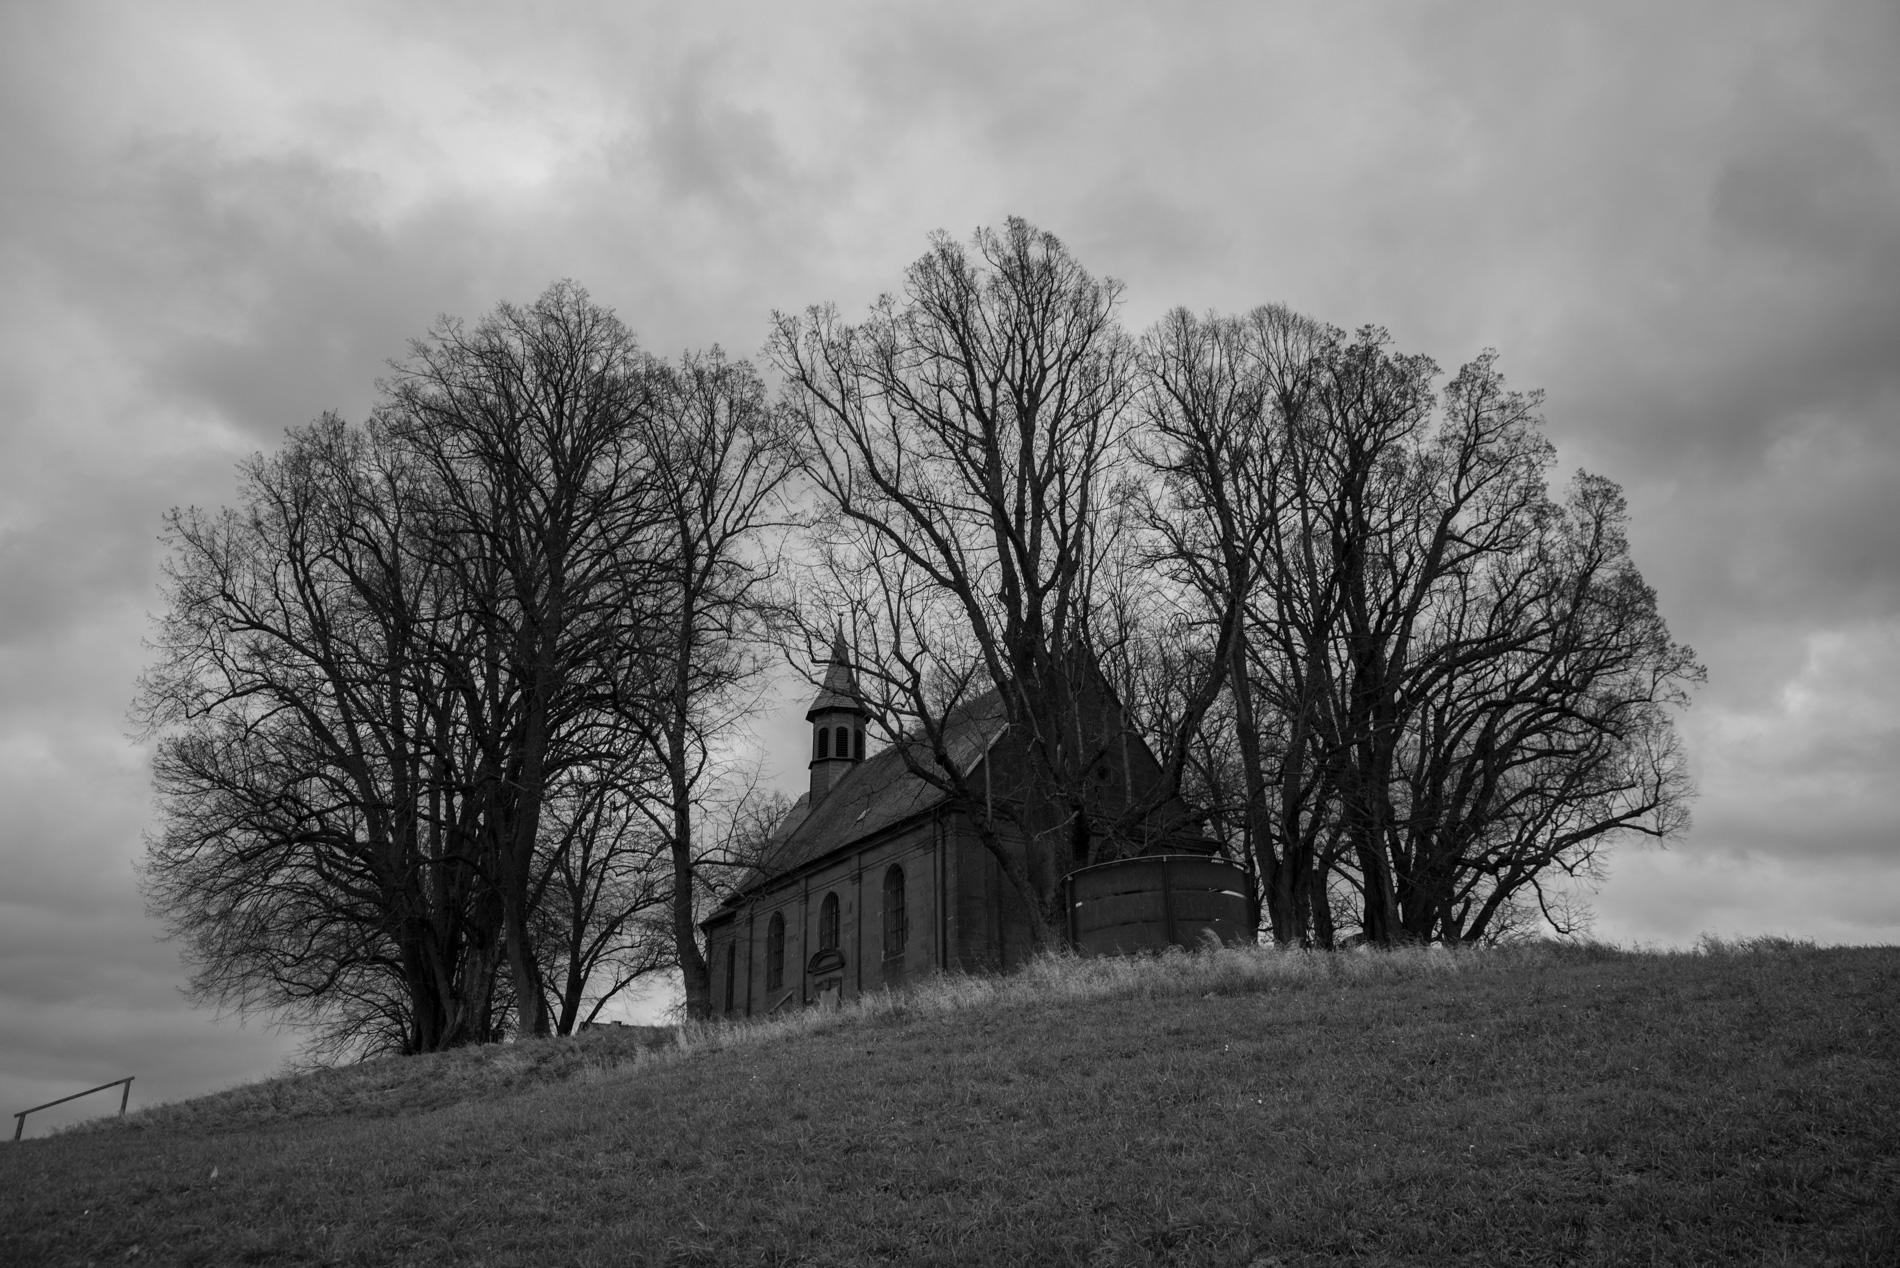 St.-Viets-Kapelle auf dem Ansberg